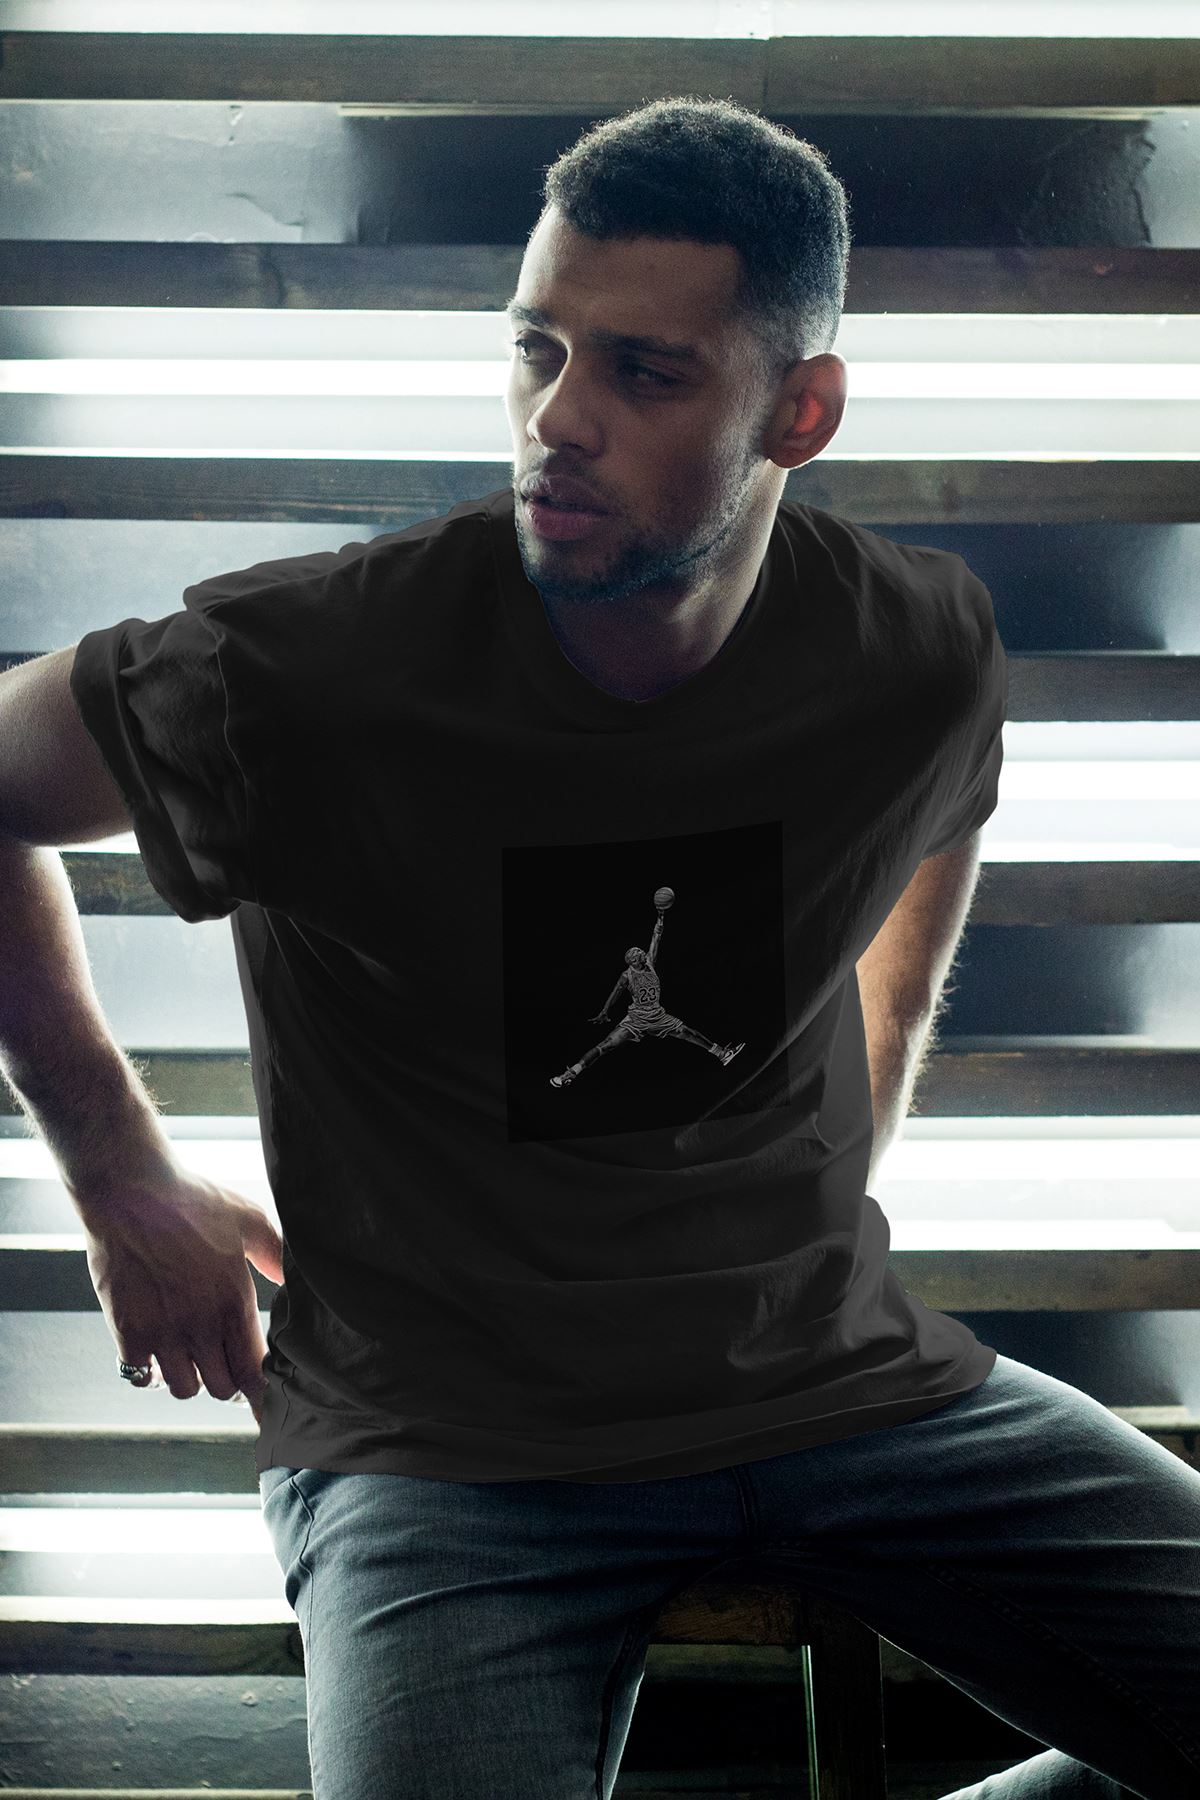 JumpMan Black Fon Siyah Erkek Oversize Tshirt - Tişört